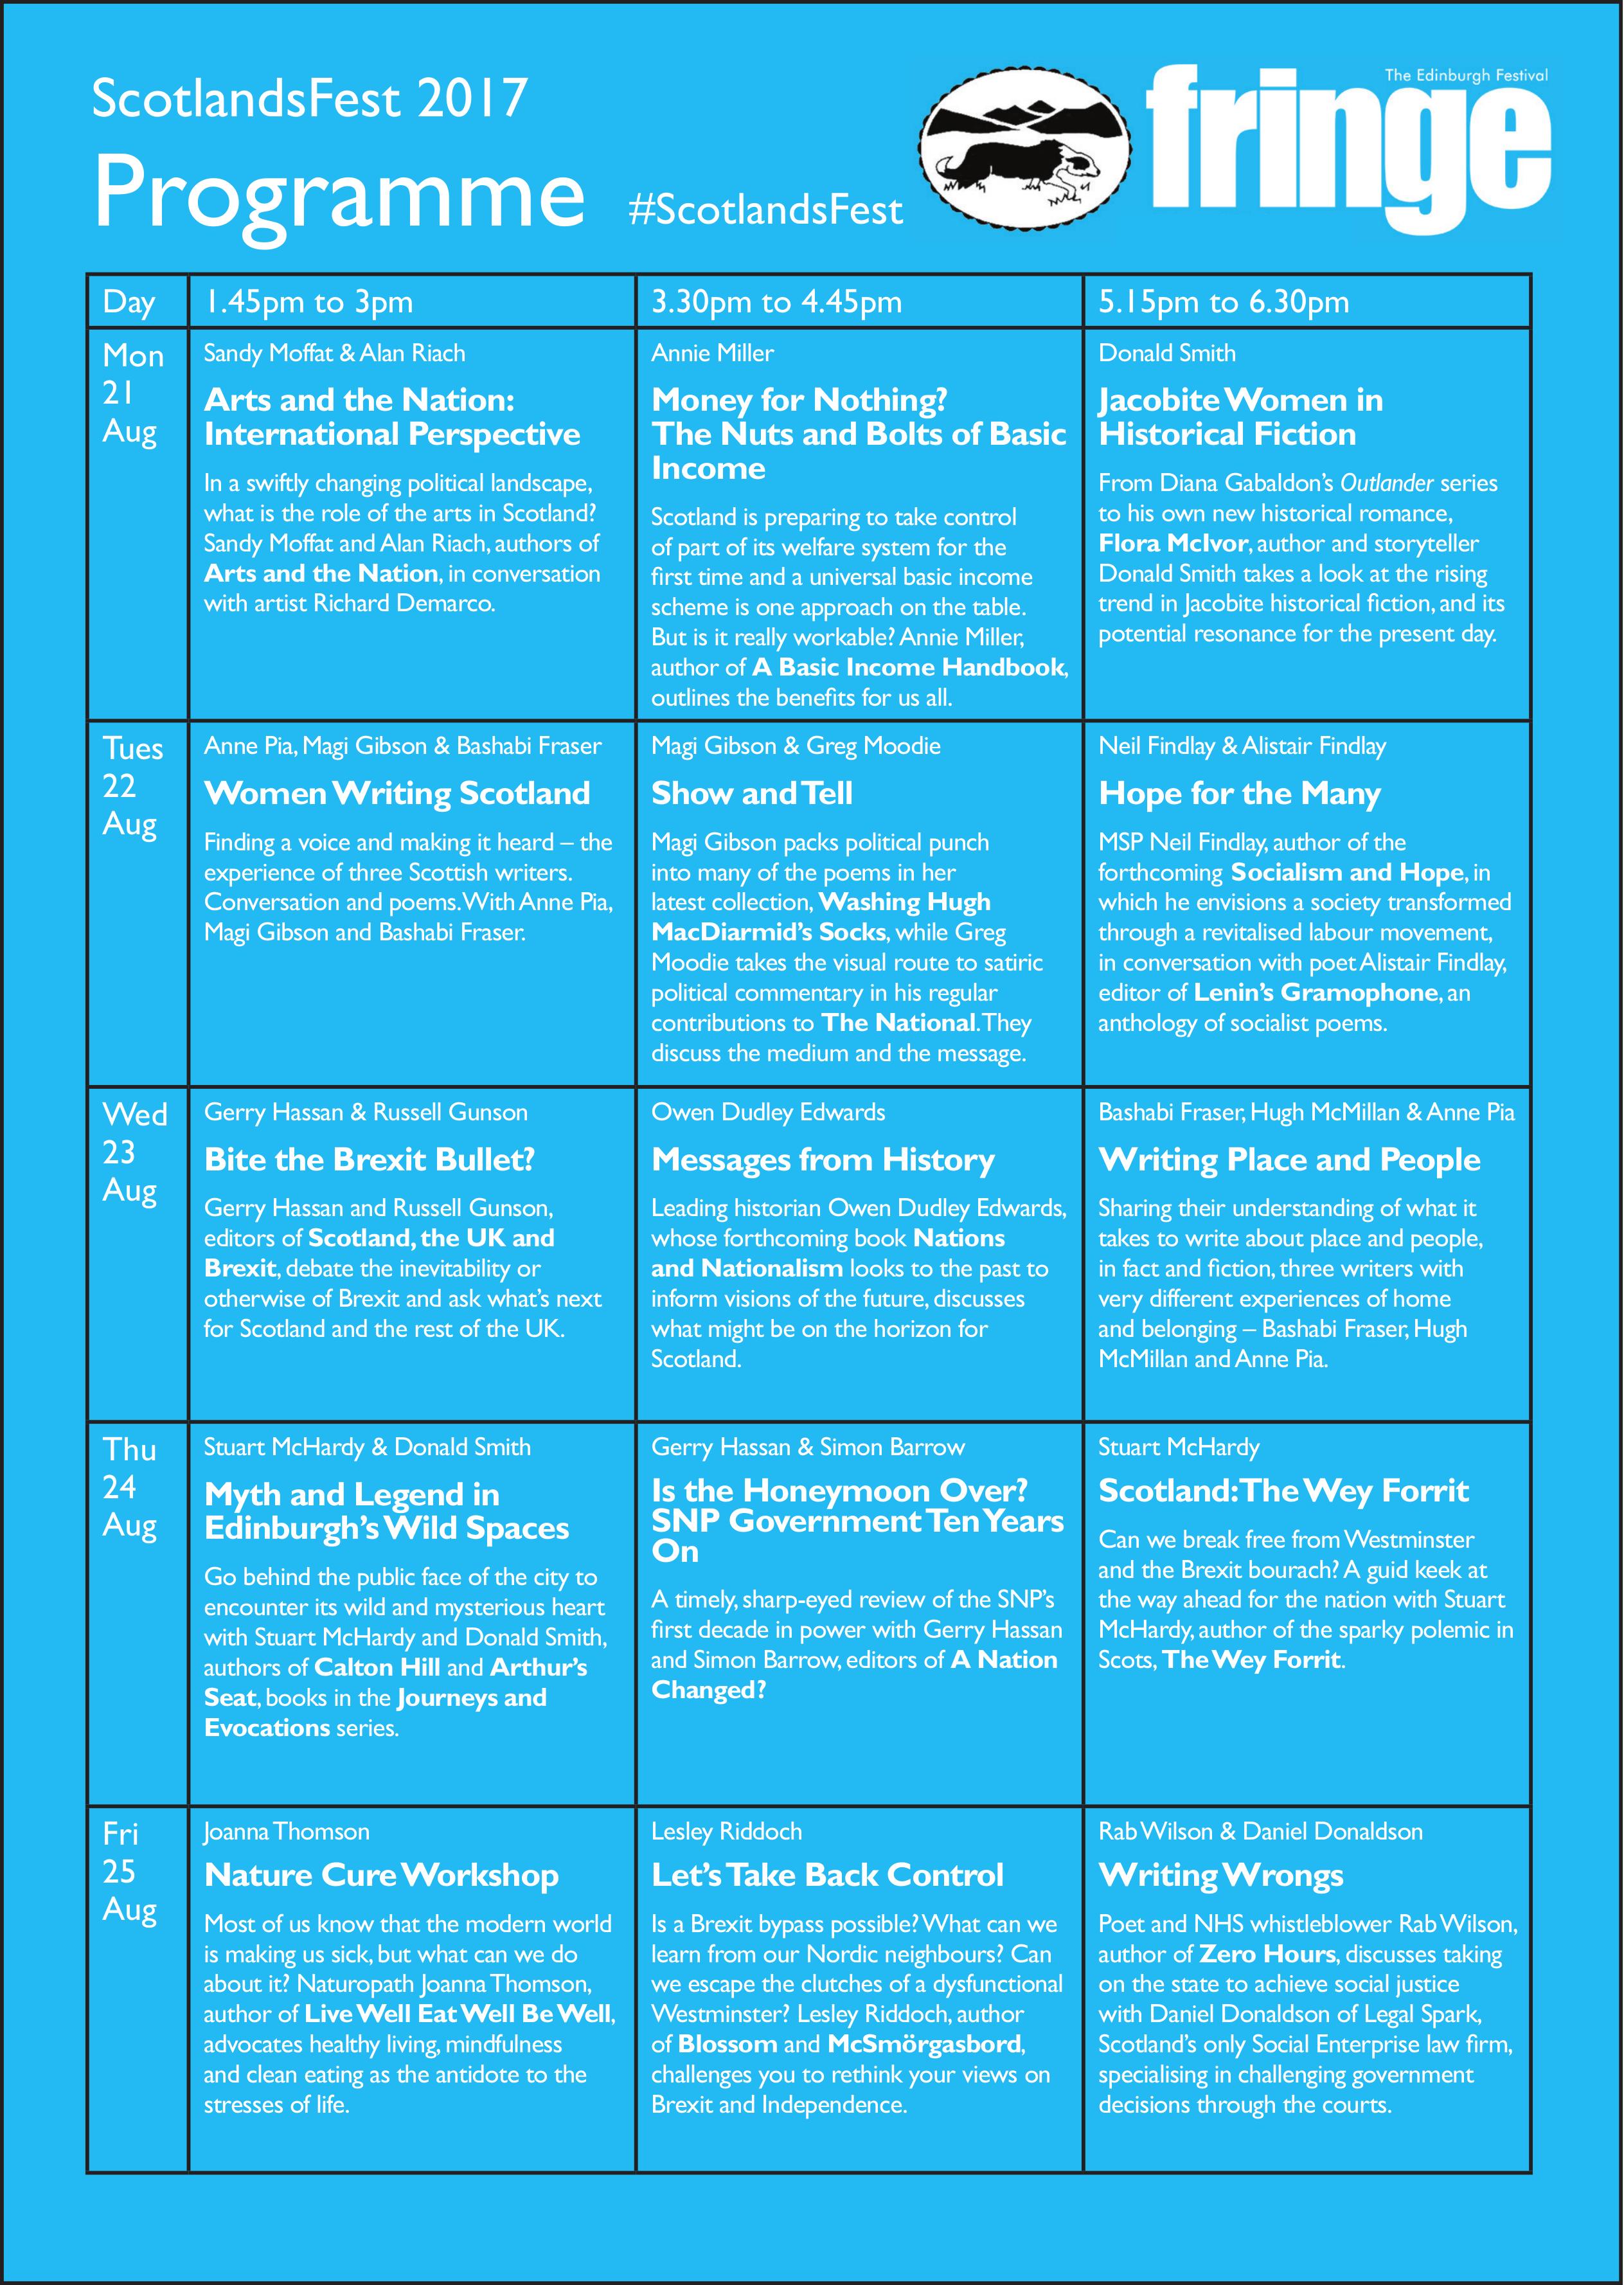 ScotlandsFest 2017 Programme